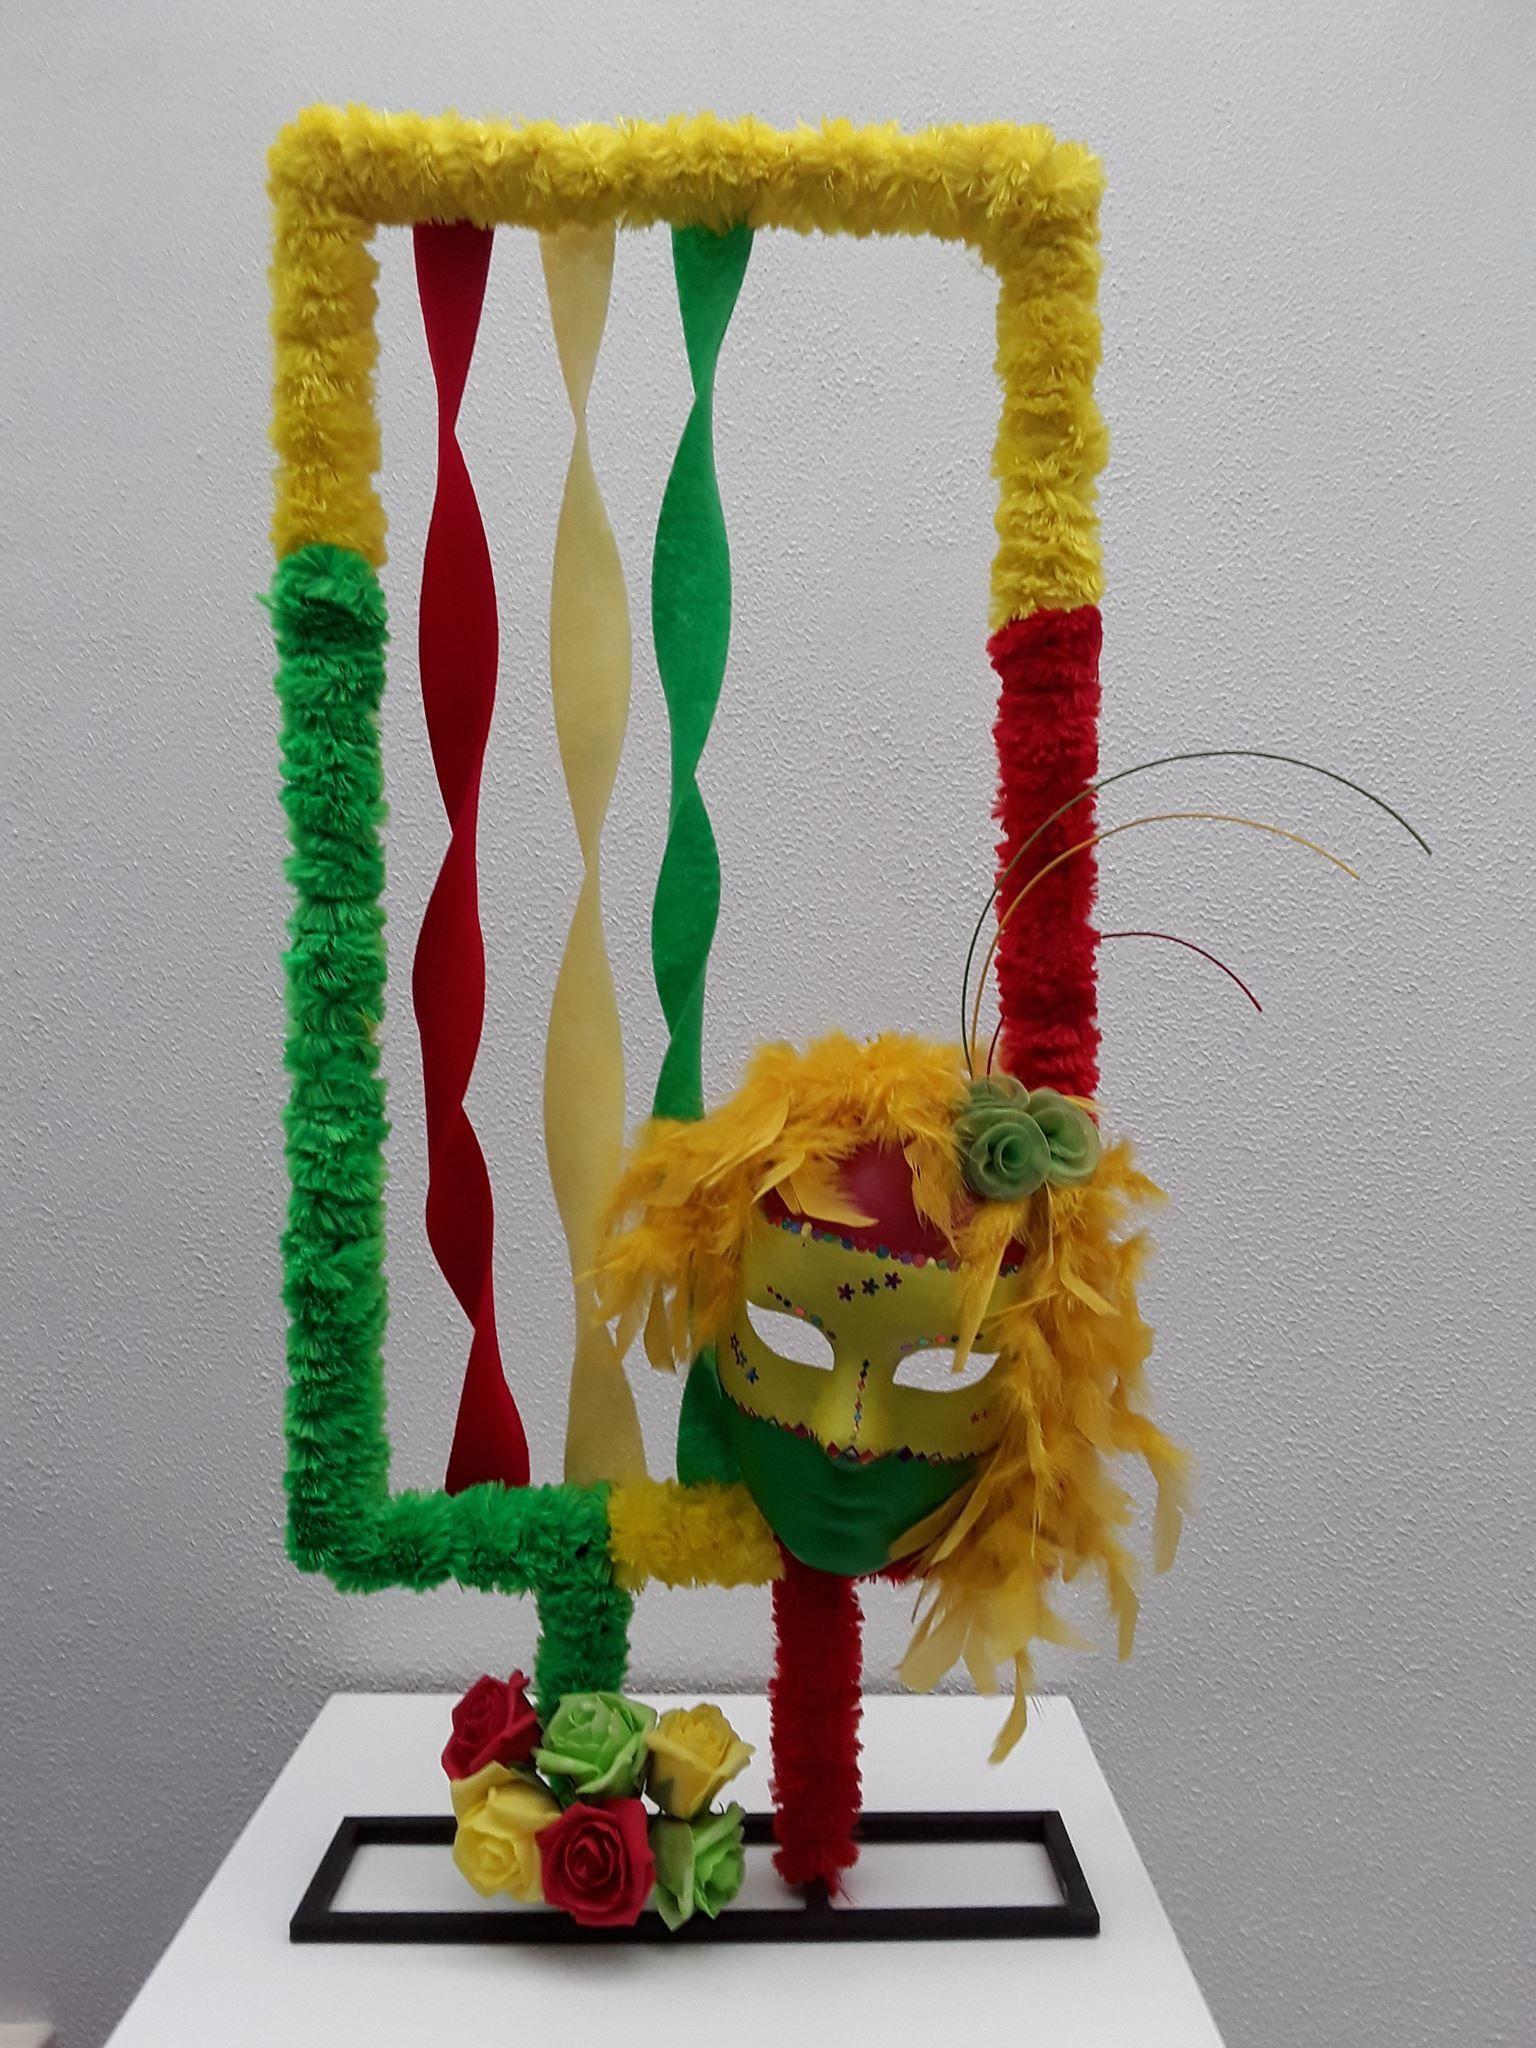 Pin Van Sabina Klabbers Op Carnaval Carnaval Decoratie Knutselen Carnaval Decoraties Carnaval Bloemstukken